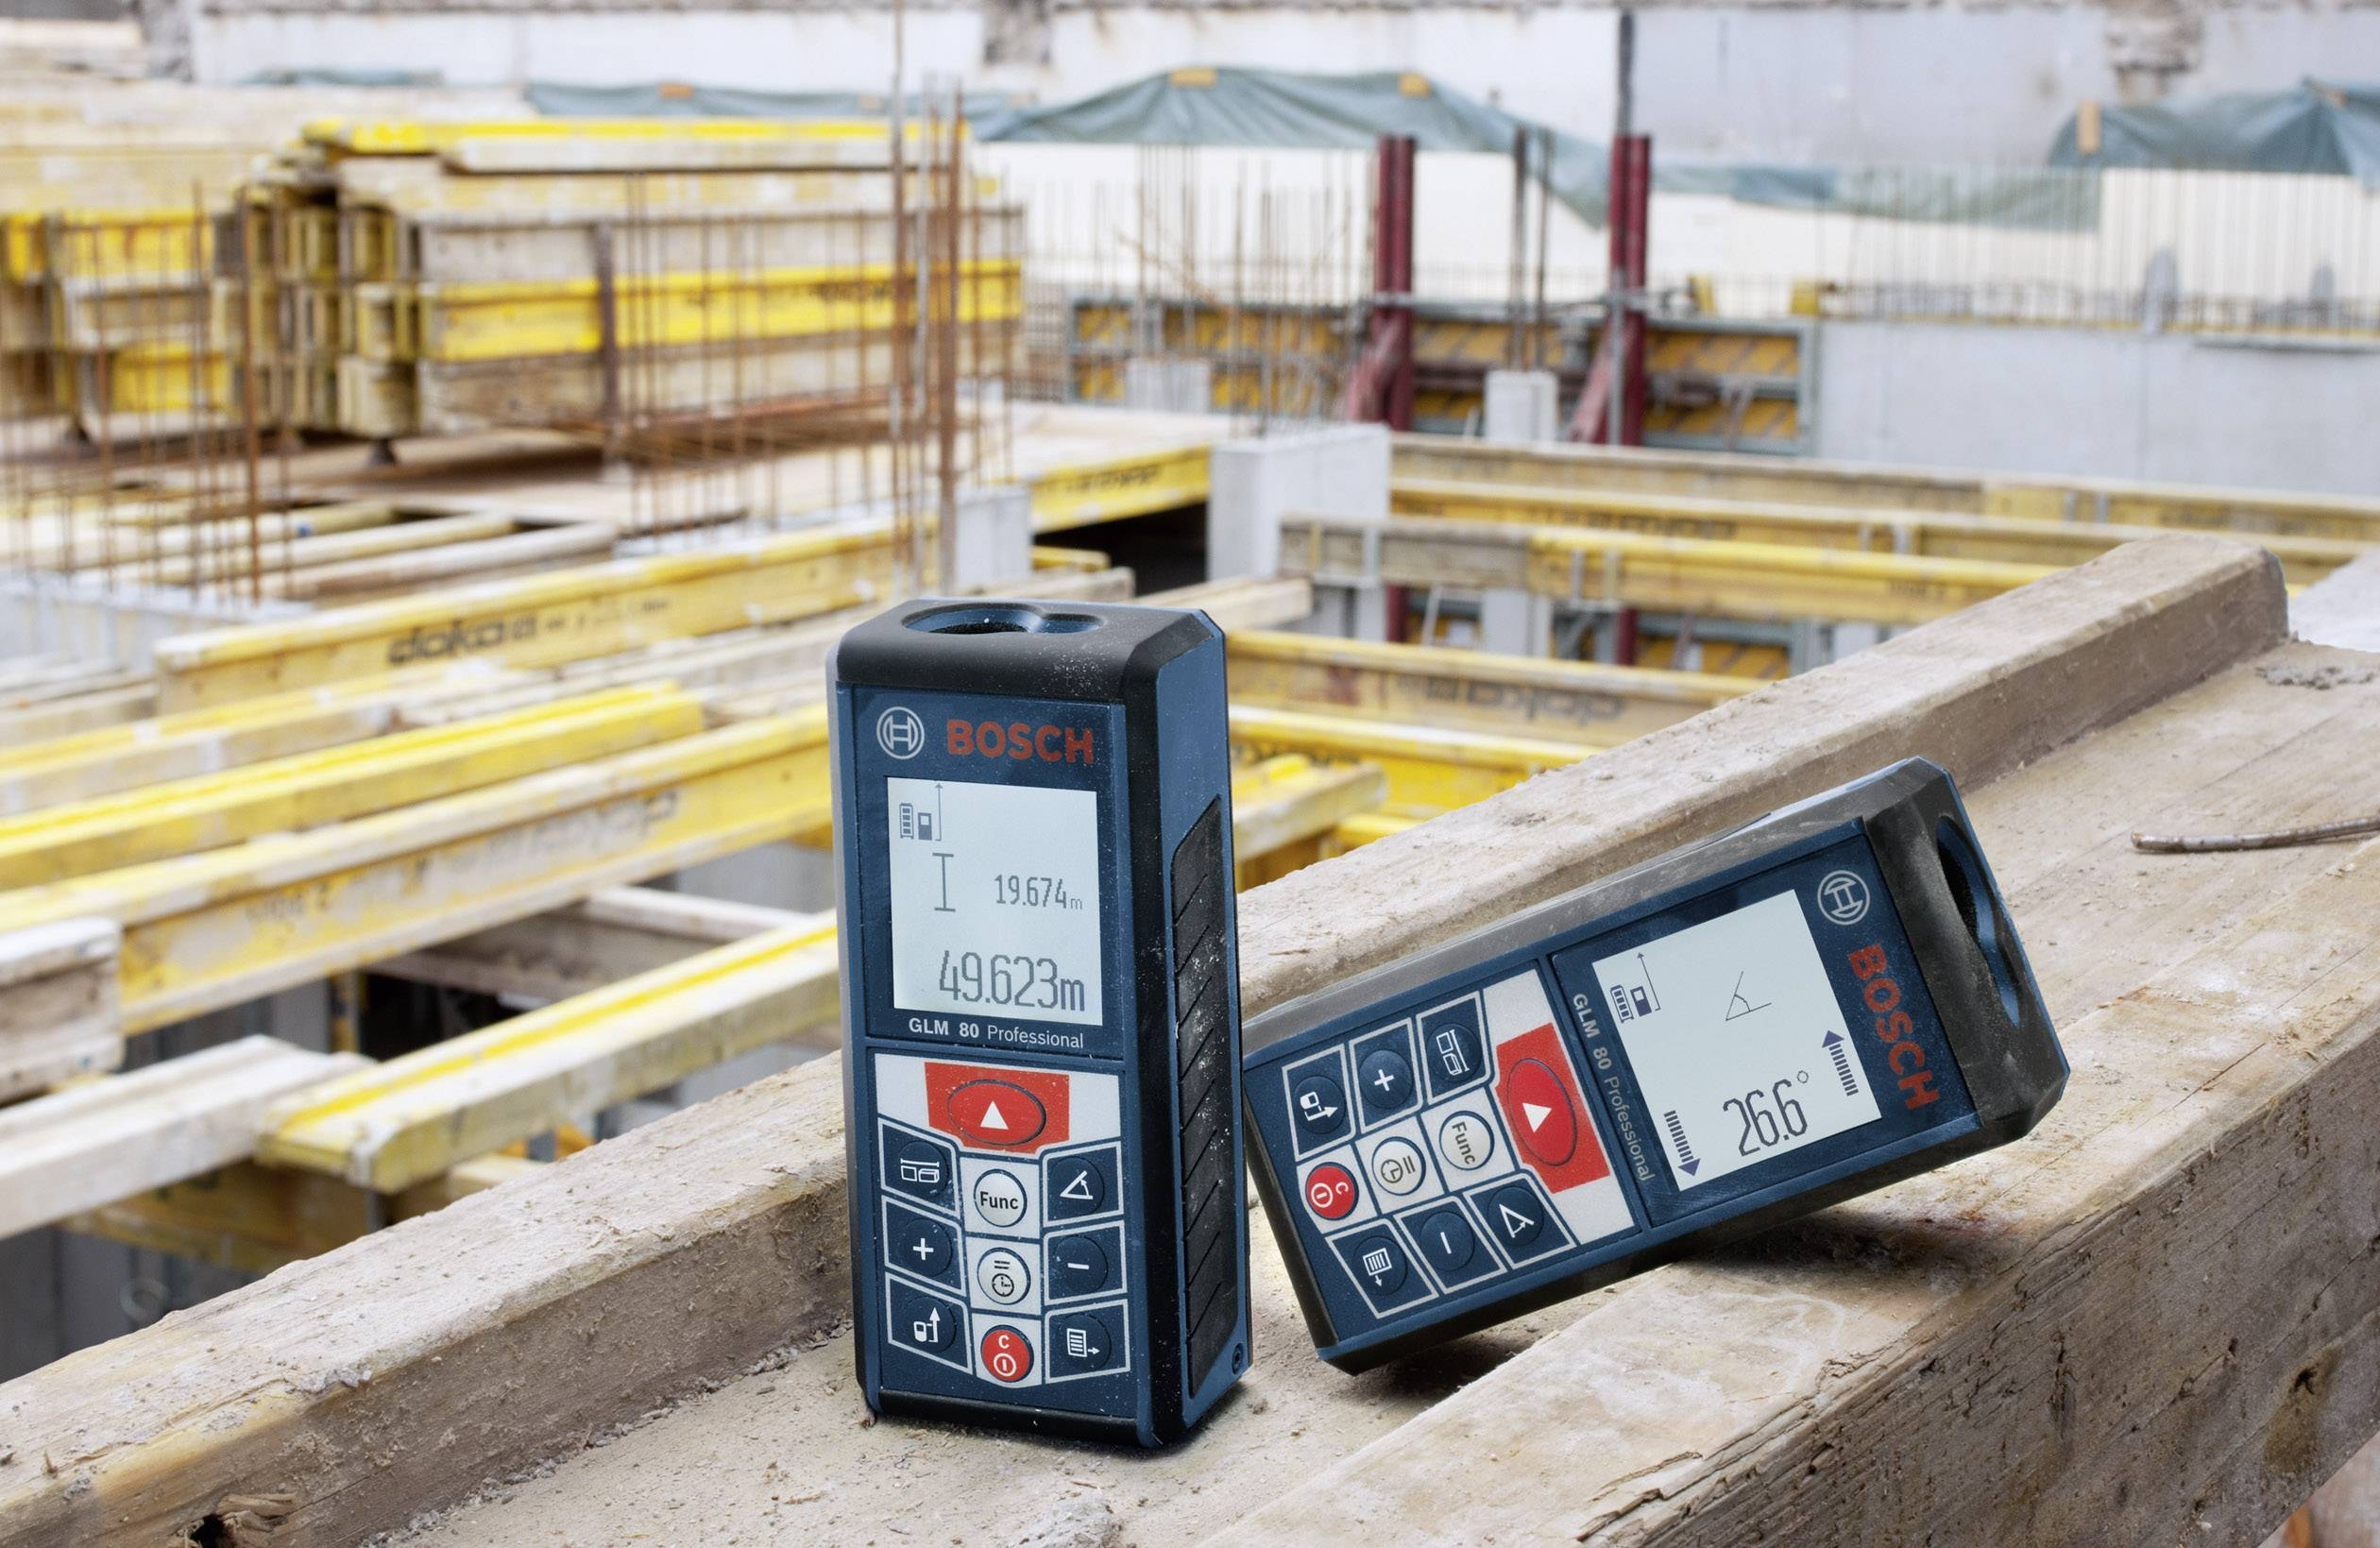 Bosch professional glm laser entfernungsmesser li ionen akku